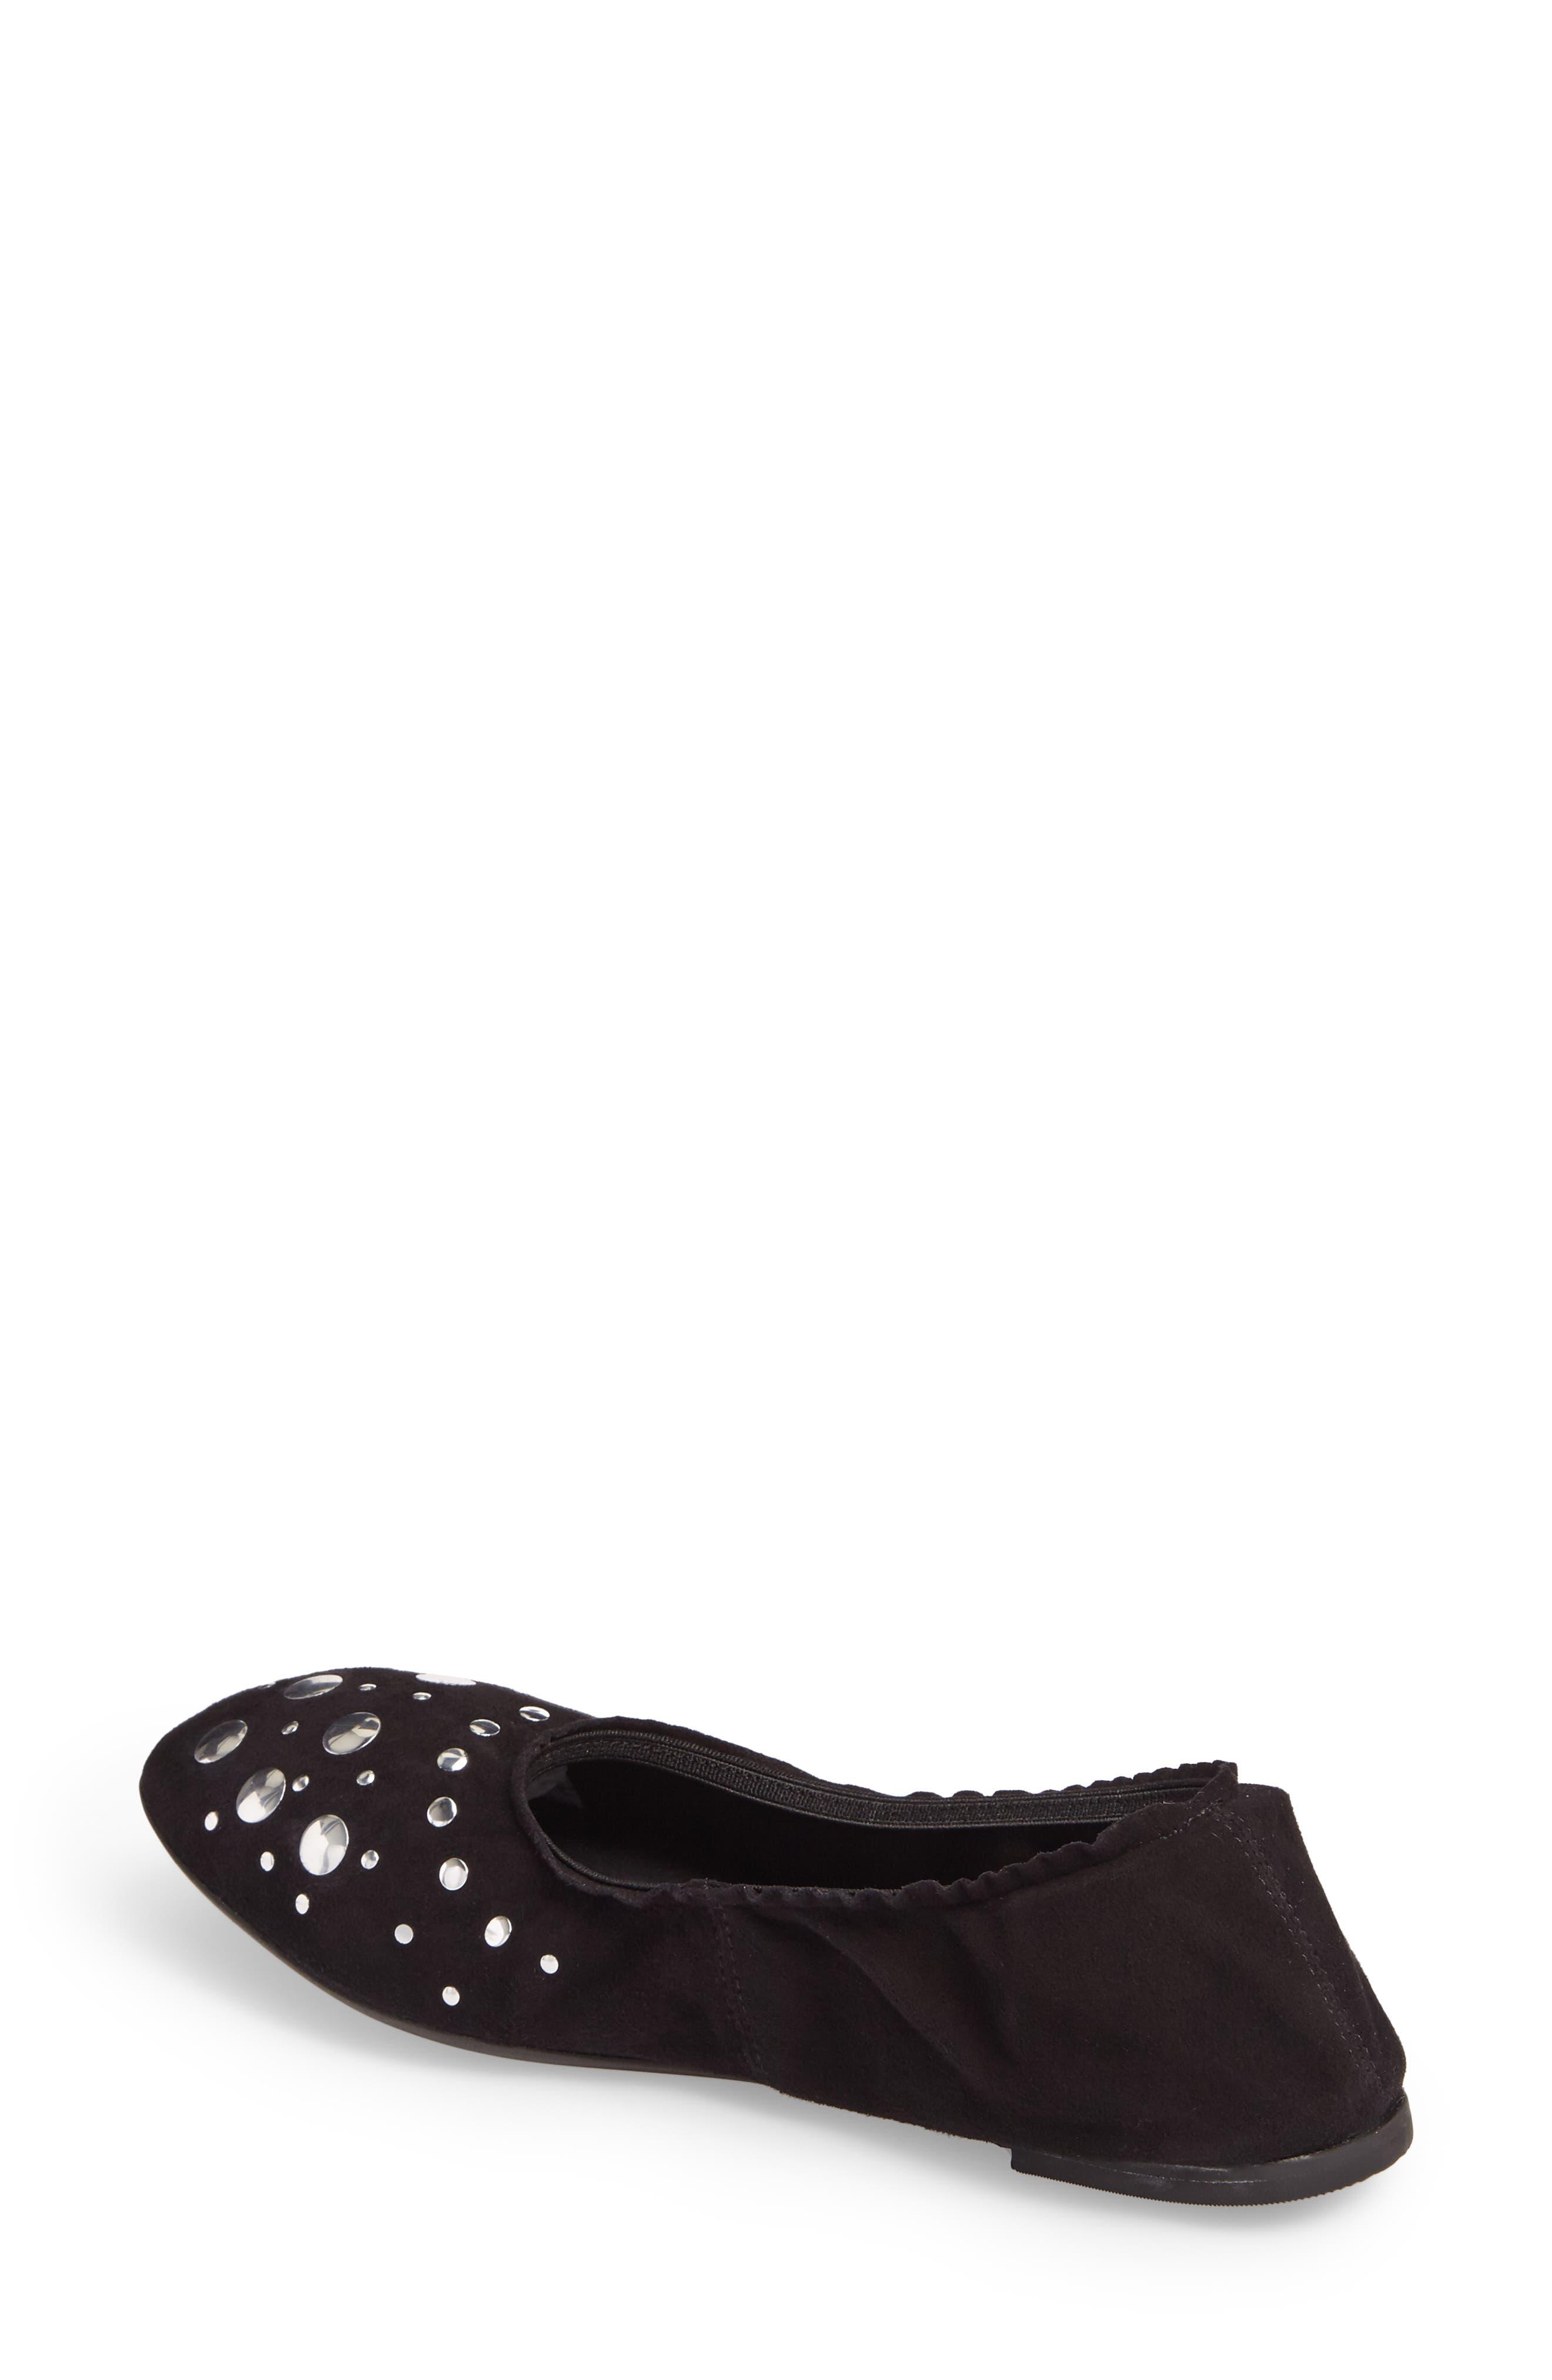 Jacob Ballet Flat,                             Alternate thumbnail 2, color,                             Black Leather